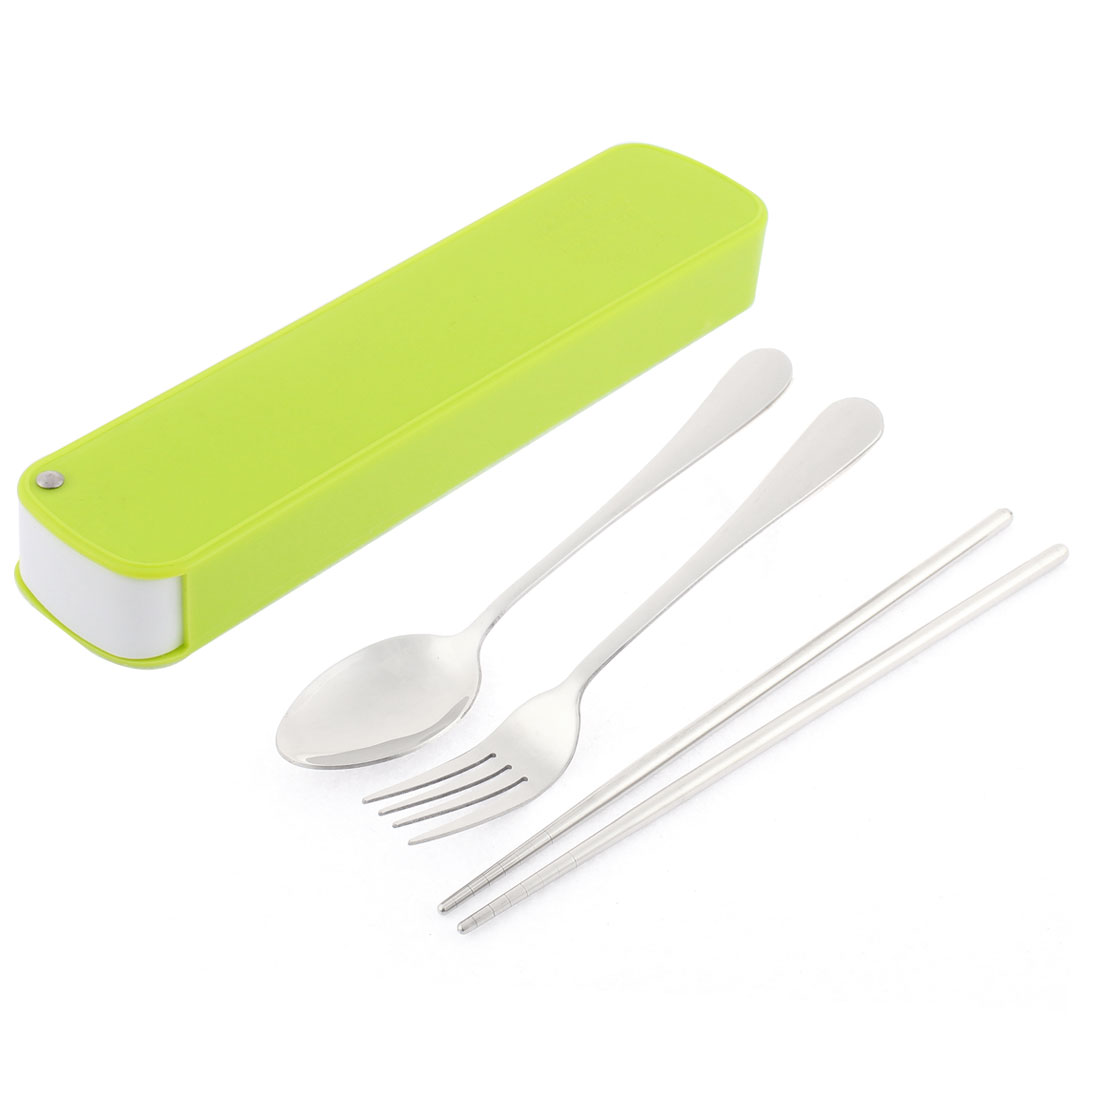 Home Kitchen Spoon Chopsticks Fork Tableware Flatware Cutlery Set w Case Yellow Green